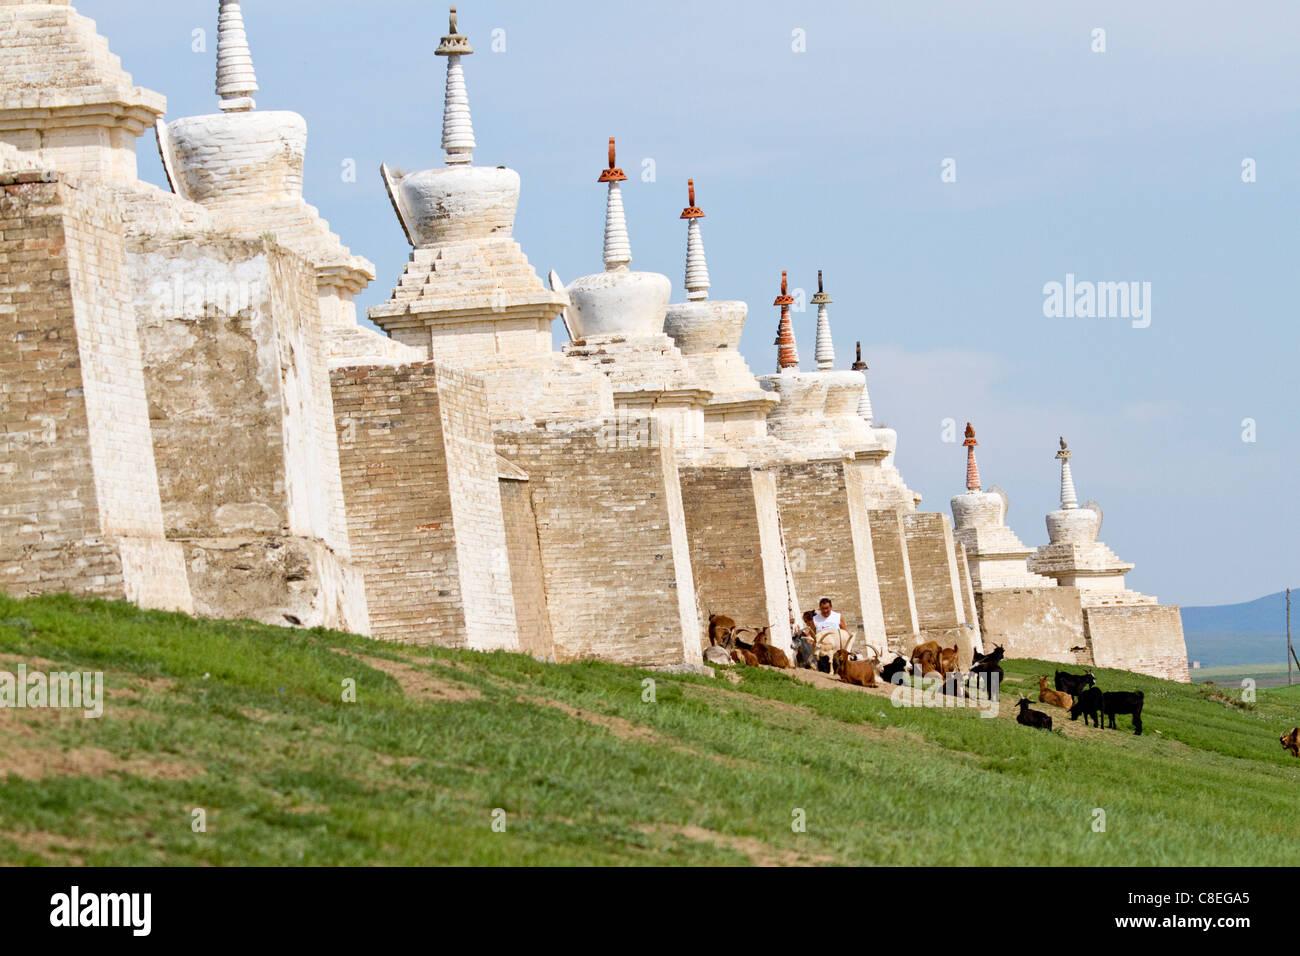 Erdene Zuu monastery in Karakorum Mongolia, exterior with stuppas. - Stock Image